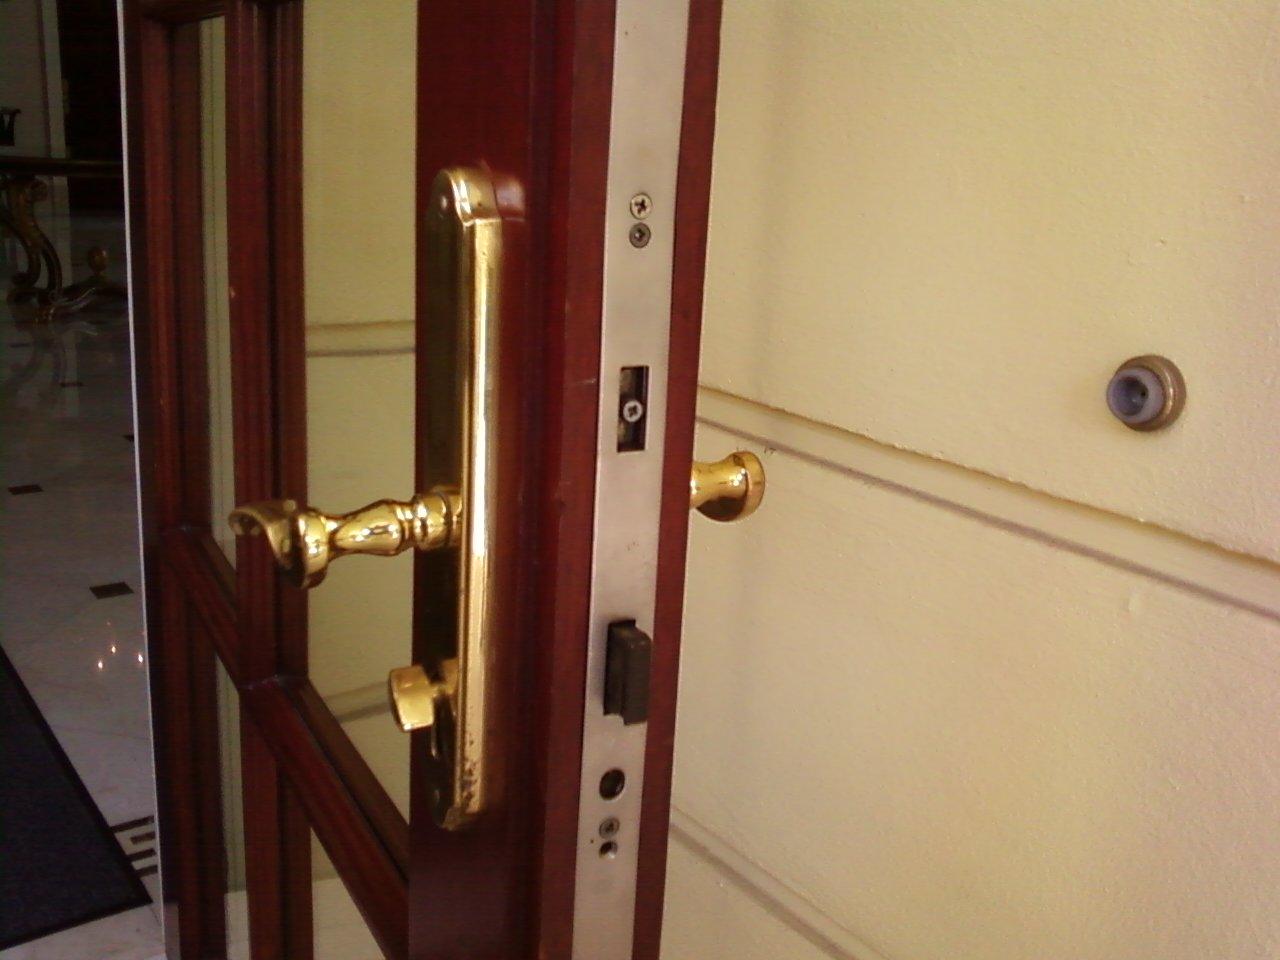 Can You Fix This Door Lock? & Can You Fix This Door Lock? - Windows Siding and Doors ...